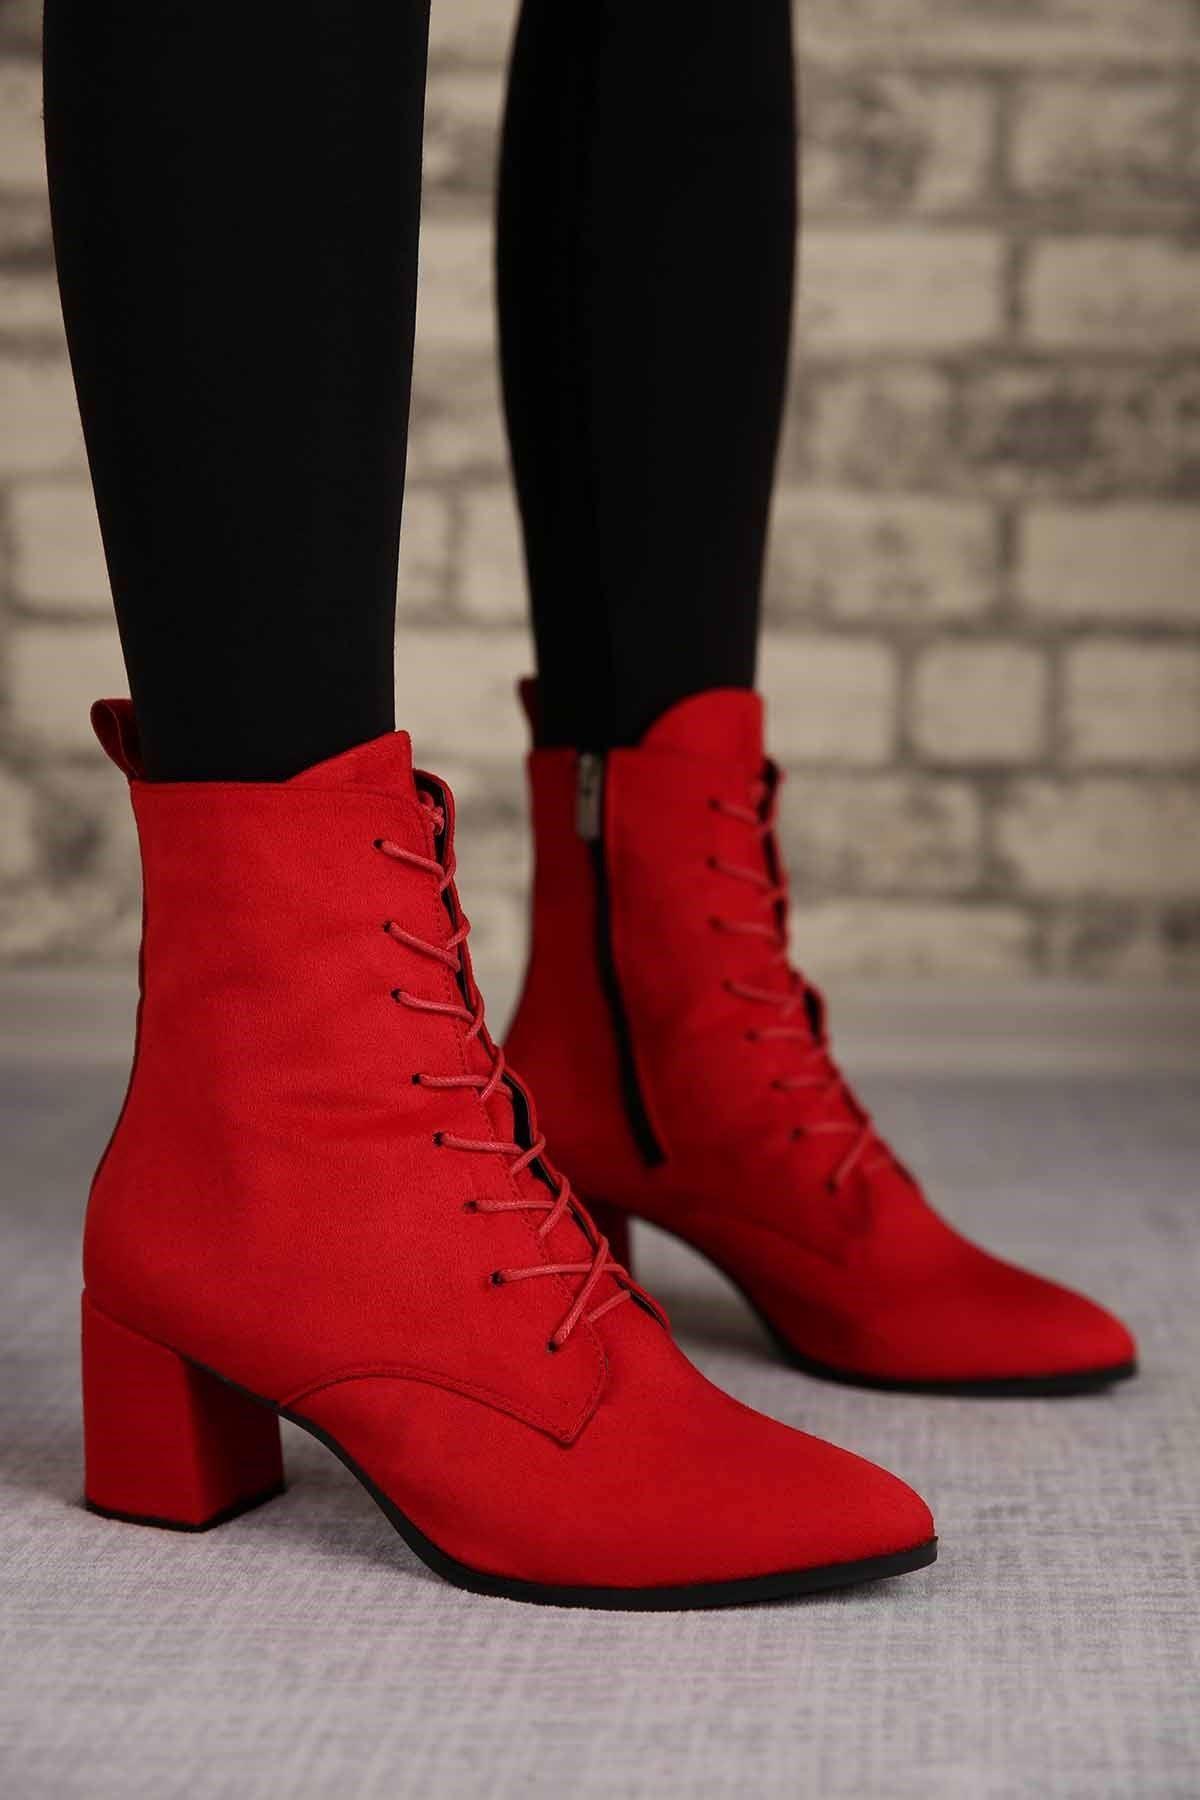 Oliver Kırmızı Süet Topuklu Kadın Bot